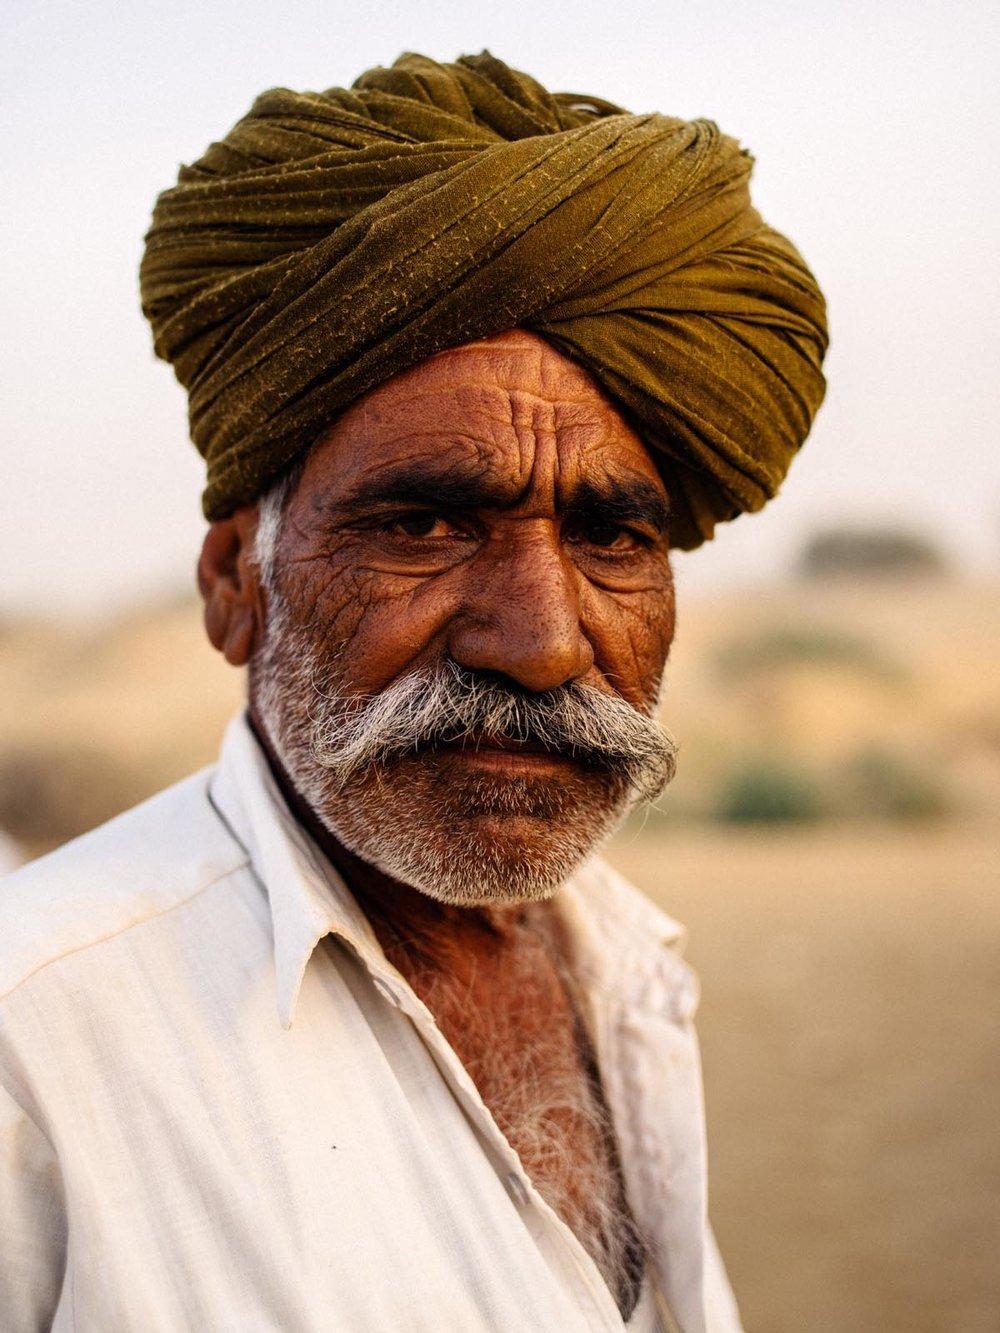 india-travel-photography-04.jpg